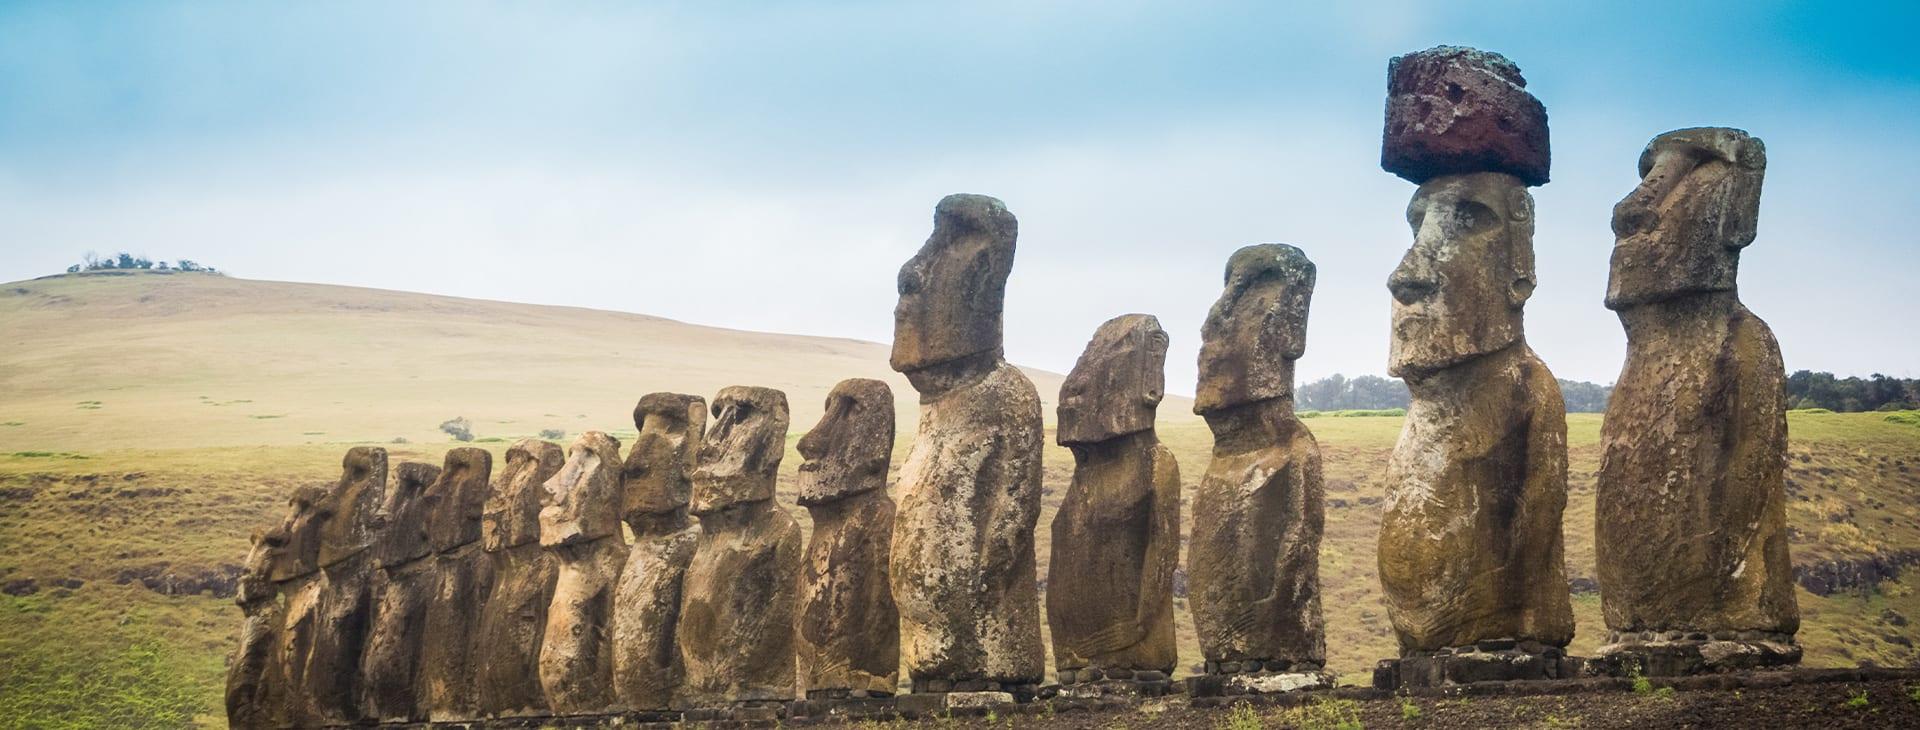 Moai Lined up Easter Island